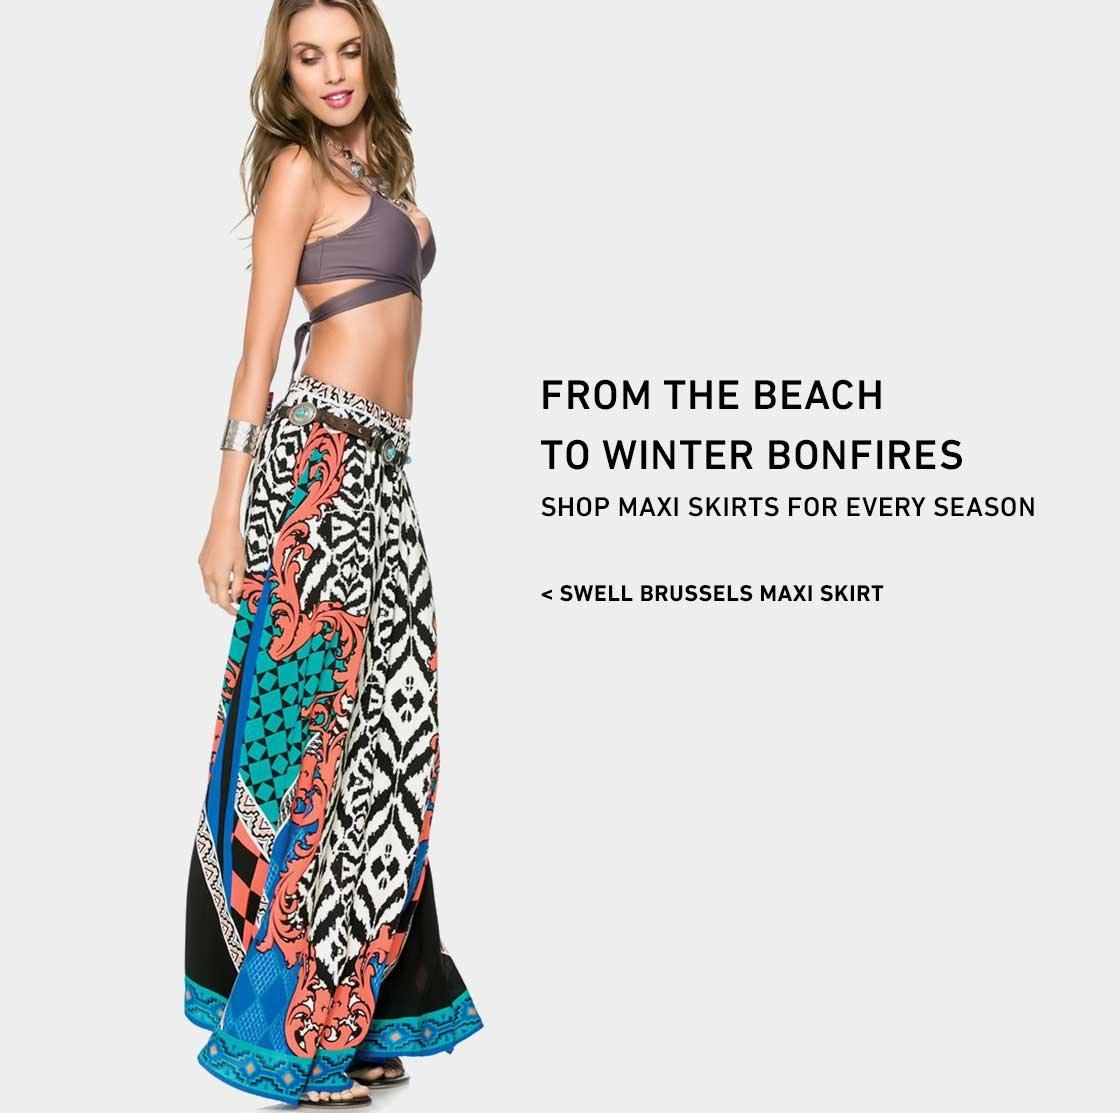 Shop New Maxi Skirts